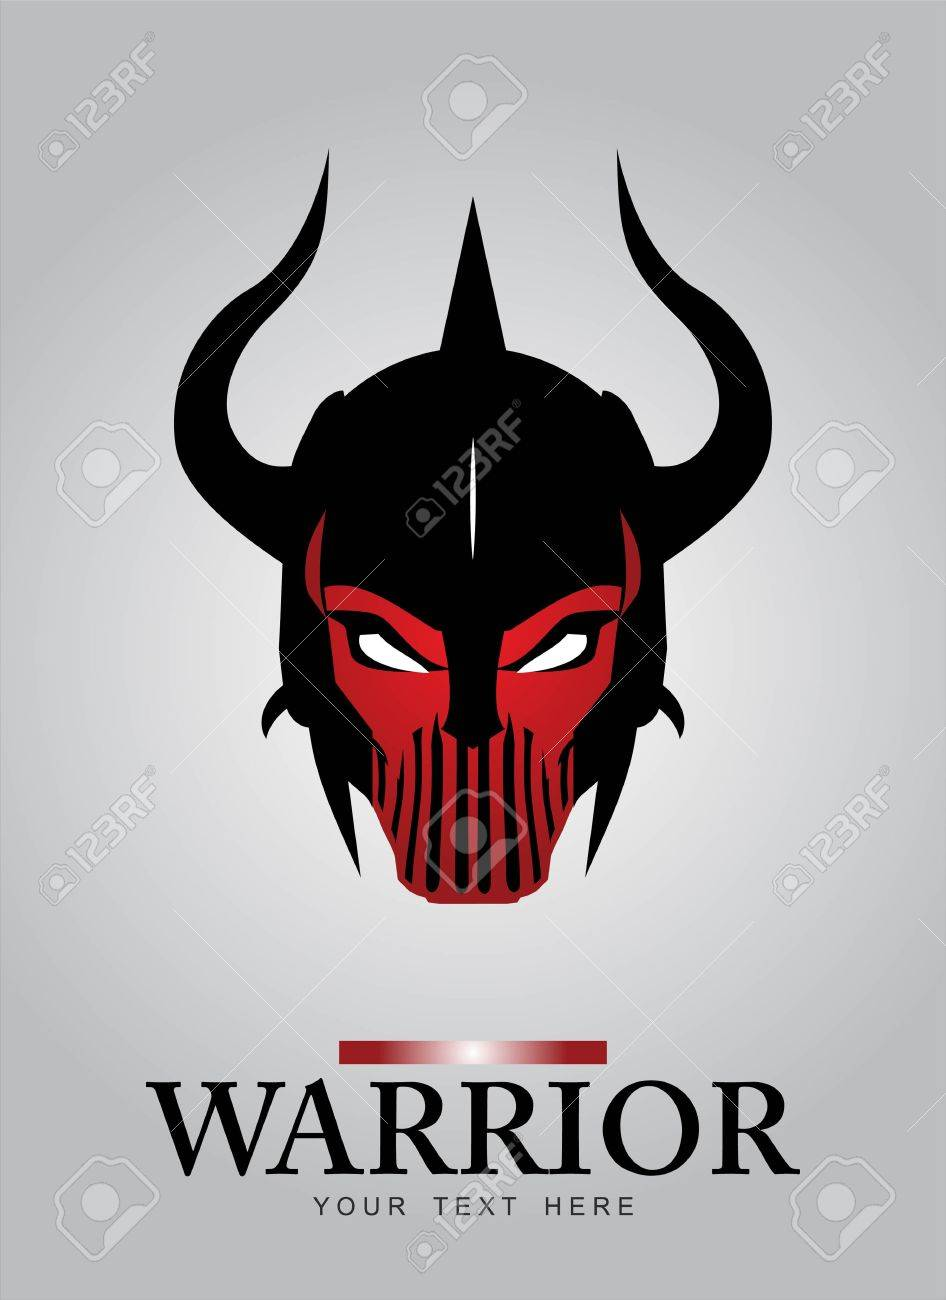 Horned head Warrior Mascot. Black Horned Warrior. Black Warrior helmet. ancient warrior head. Suitable for game icon, team identity, insignia, emblem, symbol, mascot, motorcycle/biker community, etc. - 61068132